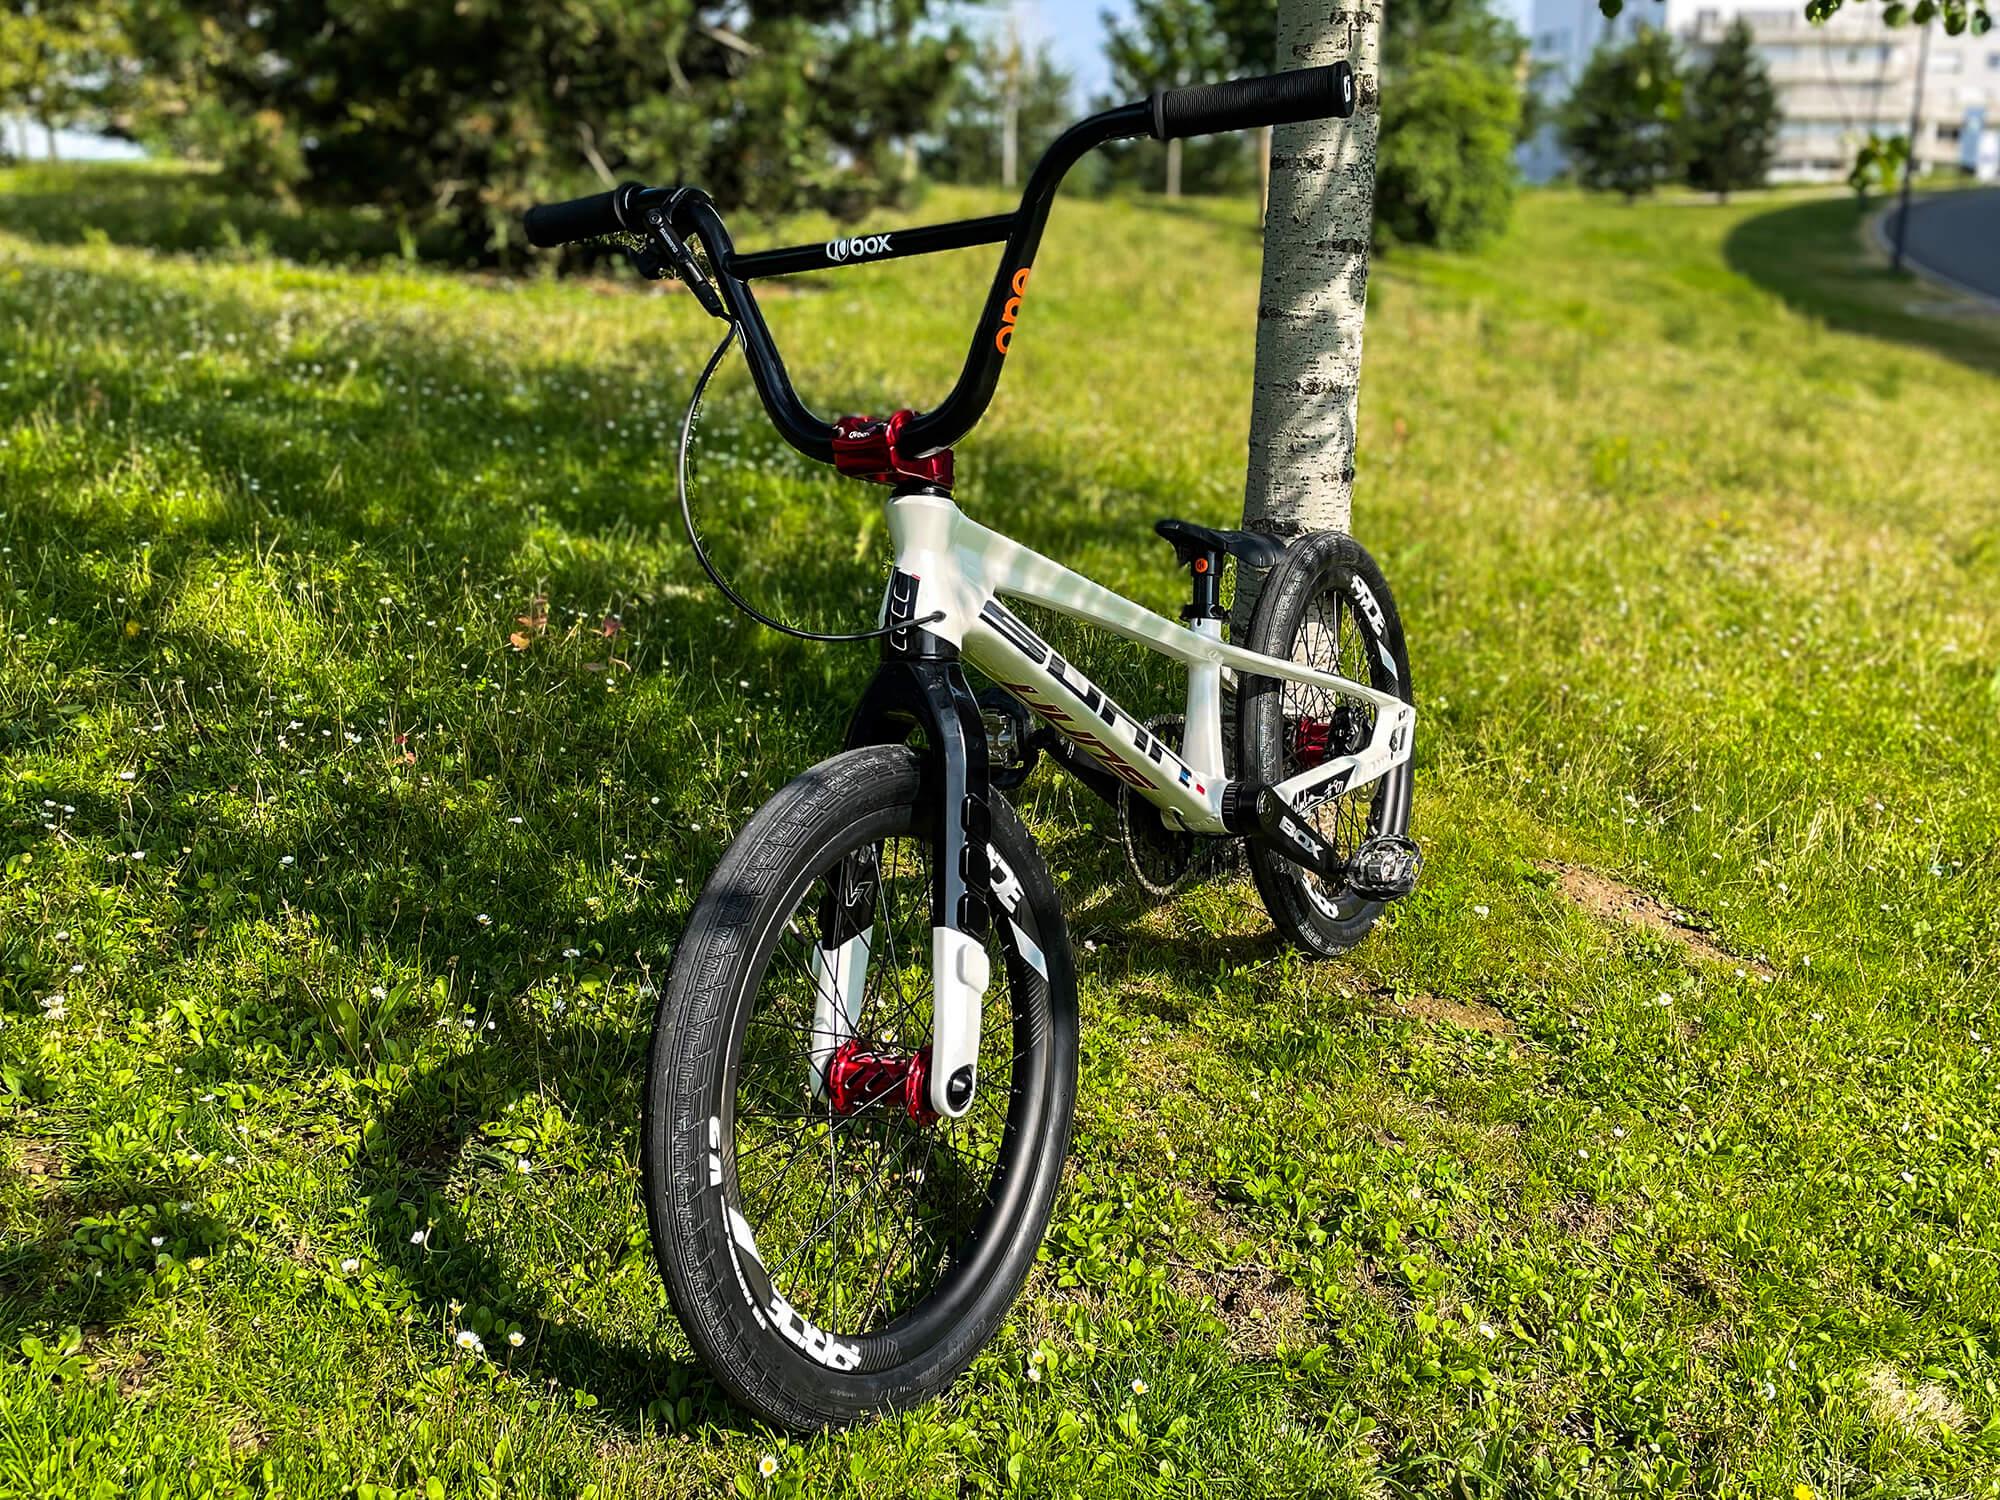 Manon Valentino Tokyo 2020 Olympic Bike left front- Manon Valentino